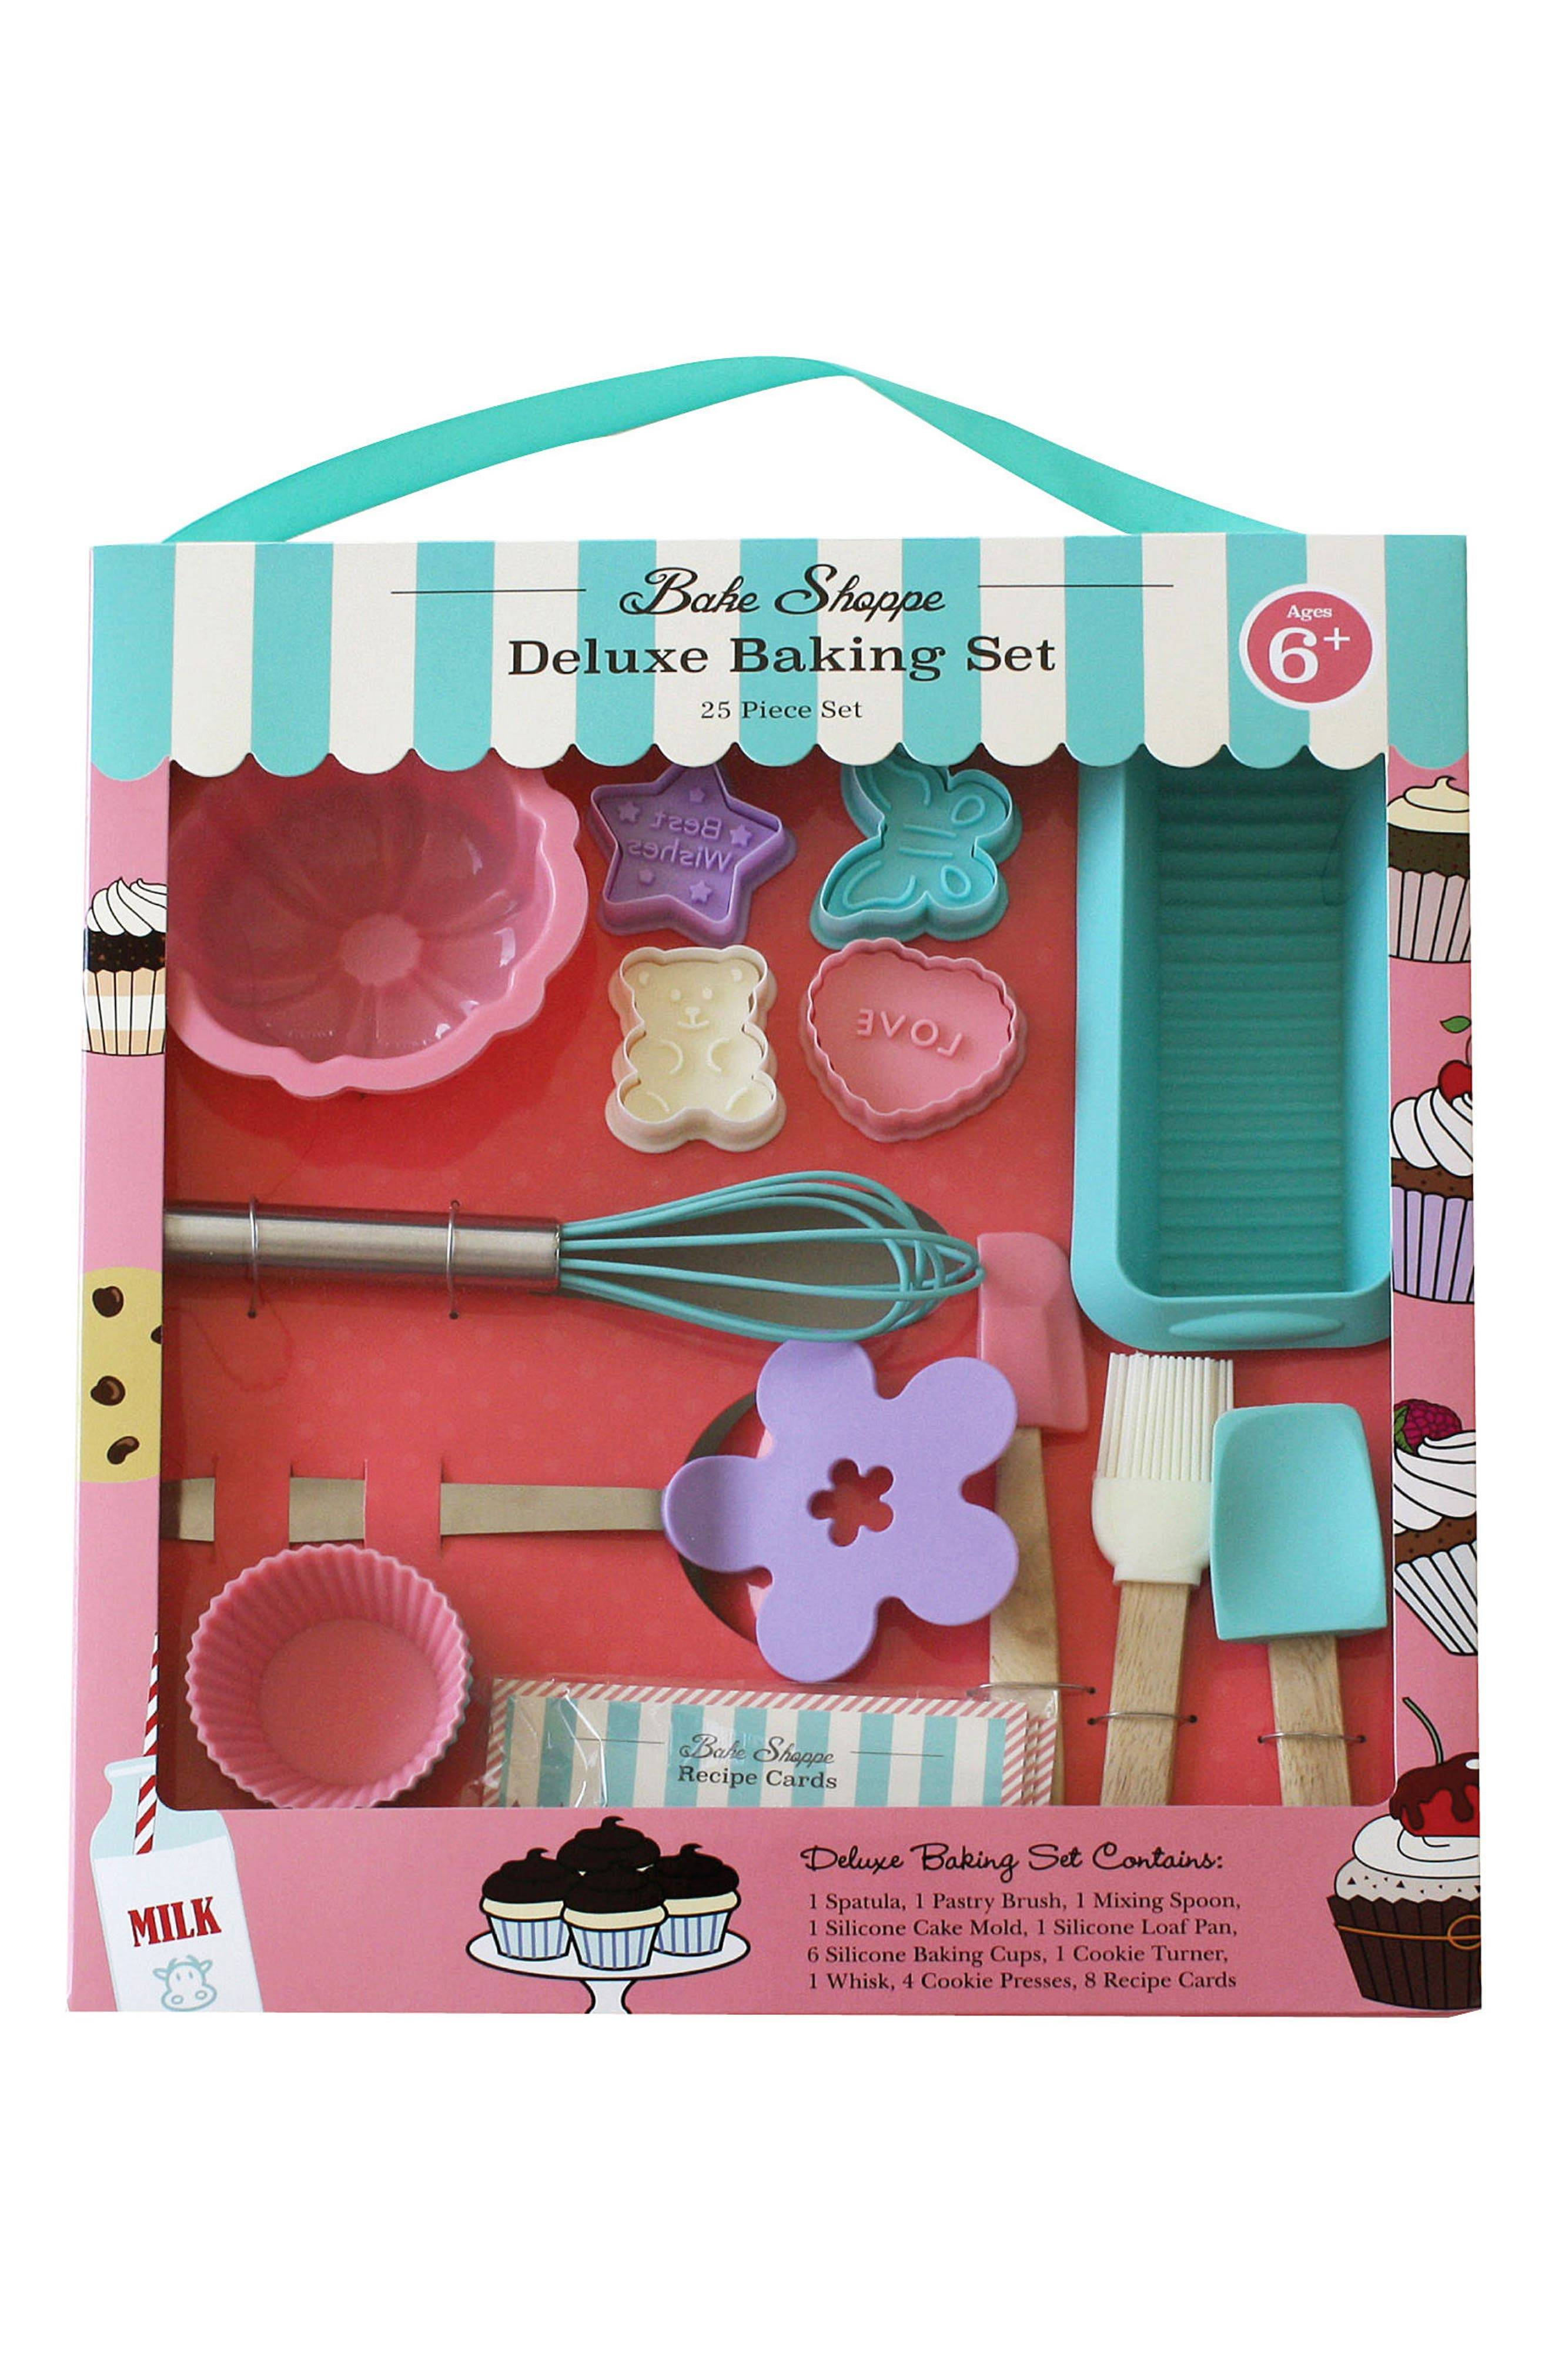 Handstand Kitchen Girl's Handstand Kitchen Bake Shoppe Deluxe Baking Kit